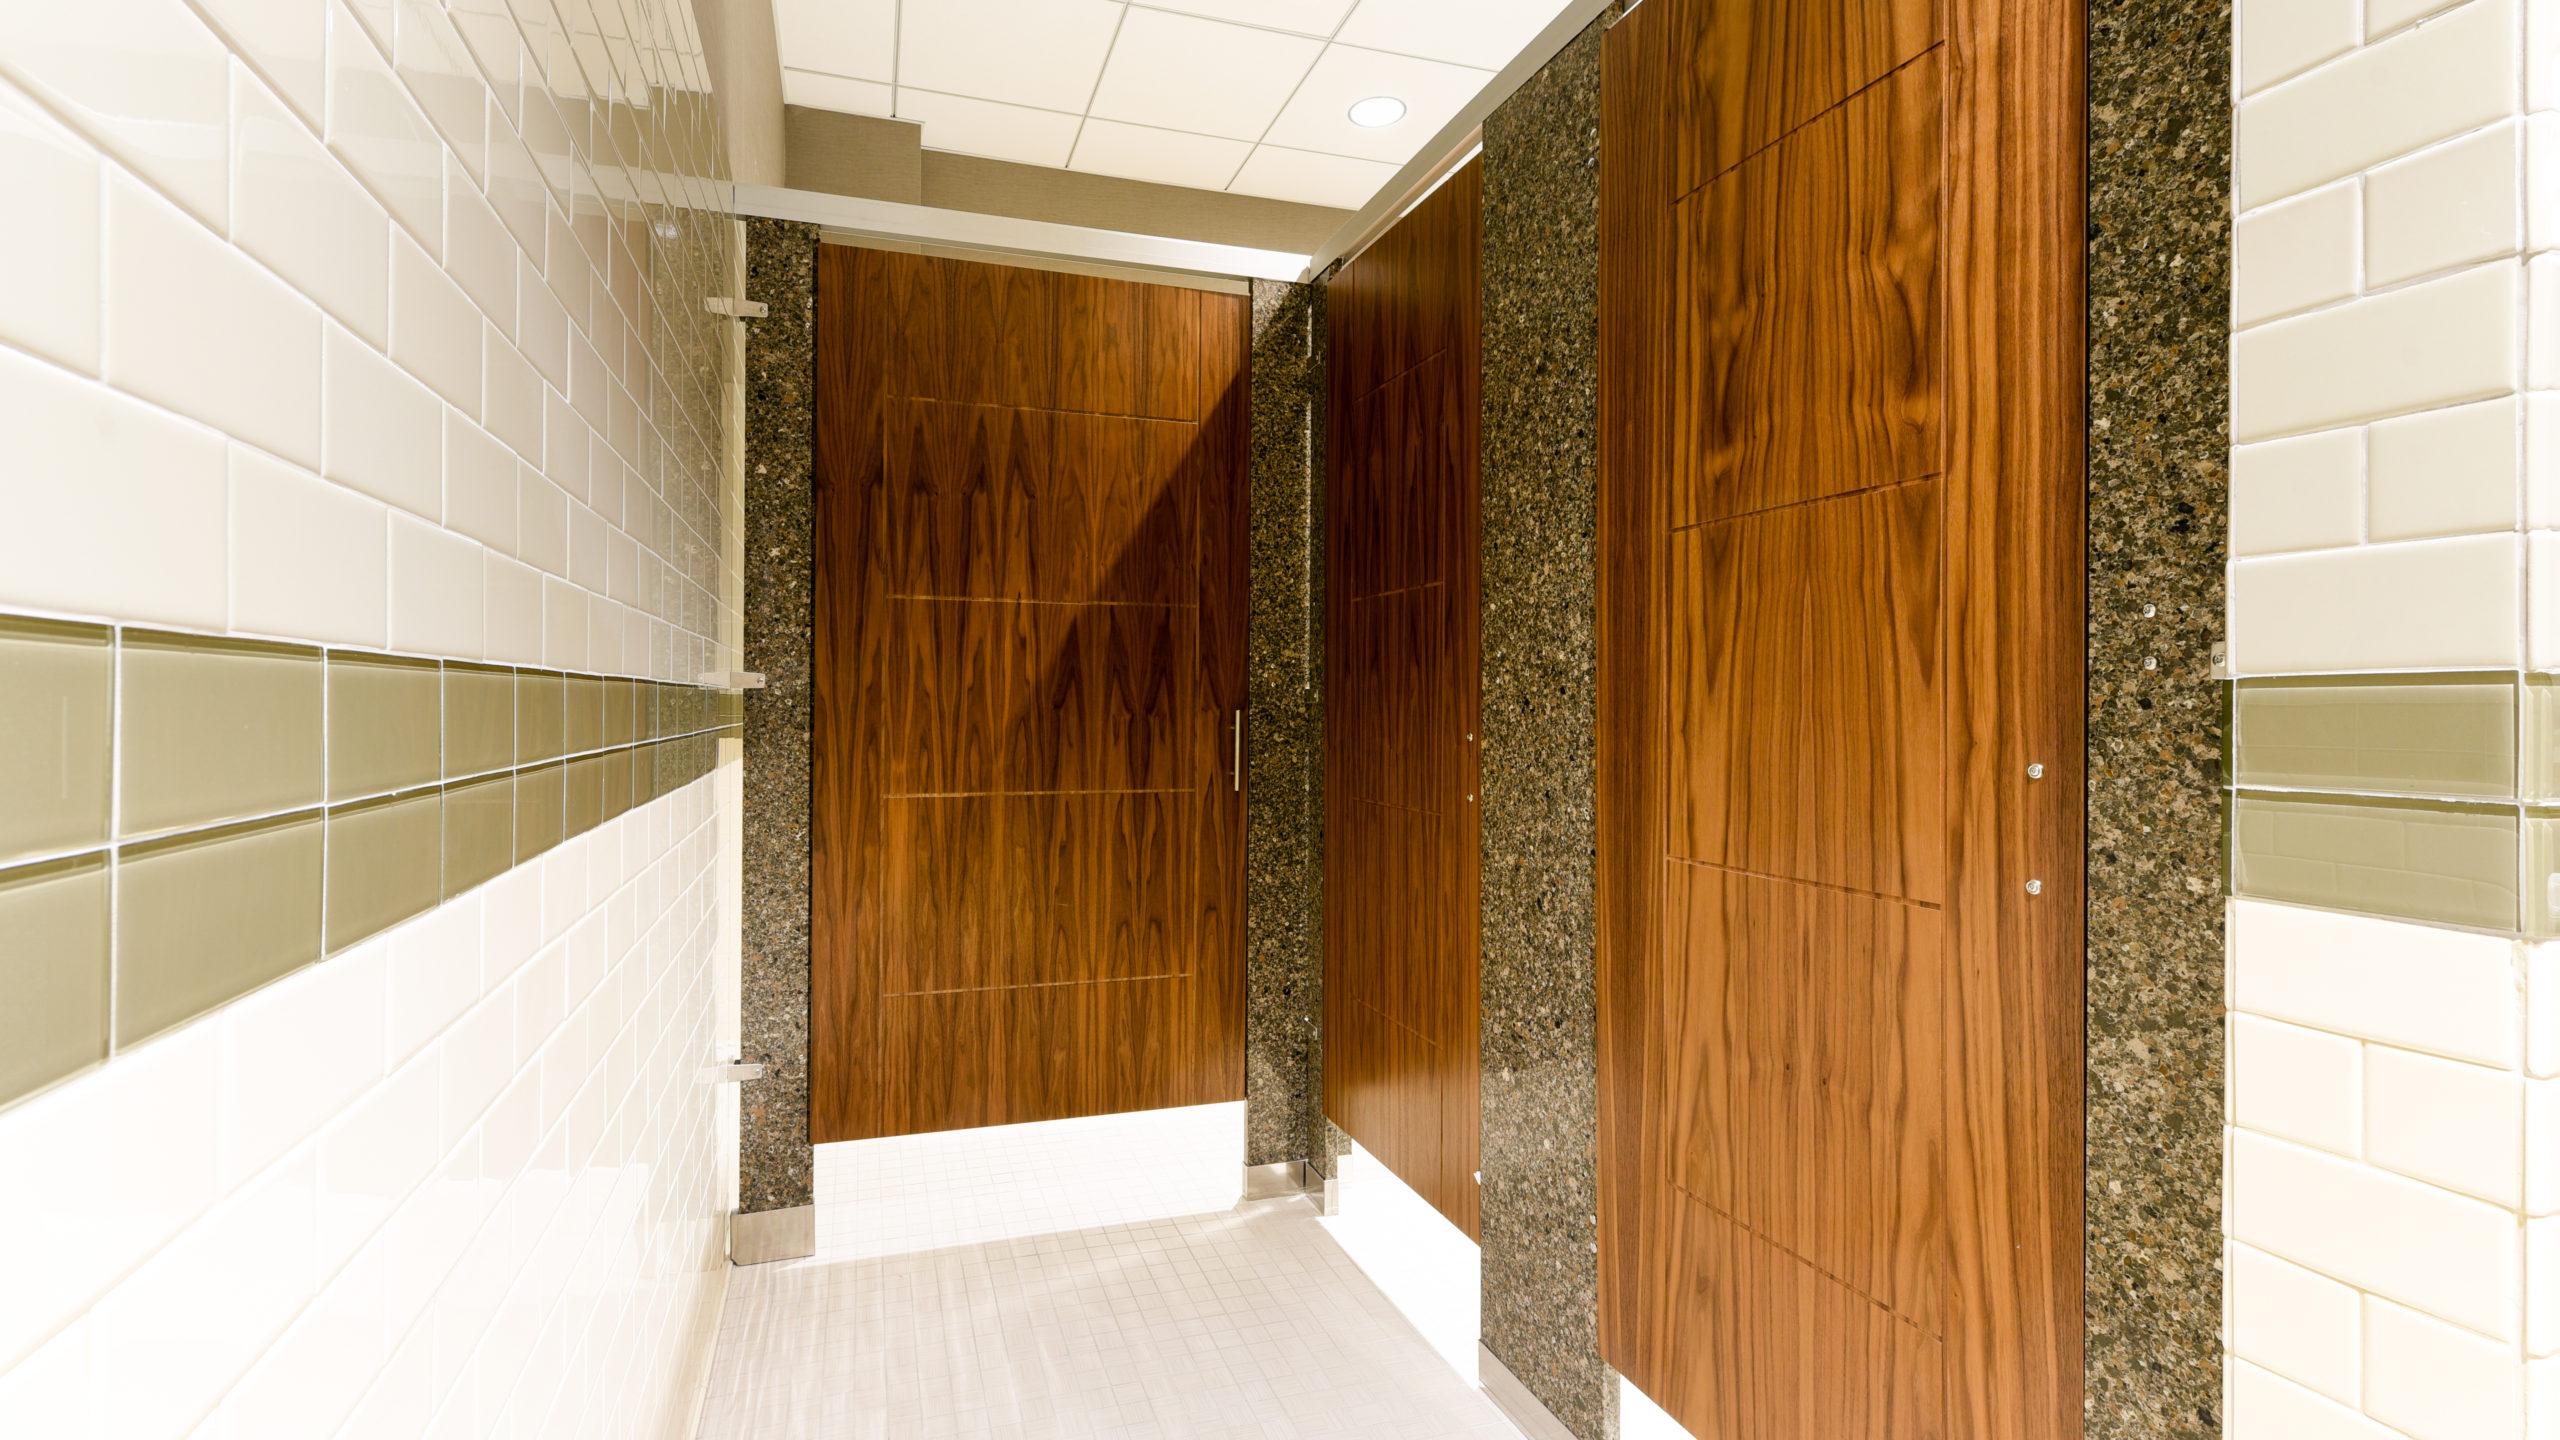 White subway tiled business showroom bathroom featuring three rich wood grain, engraved veneer doors with grey speckled engineered stone pilasters.